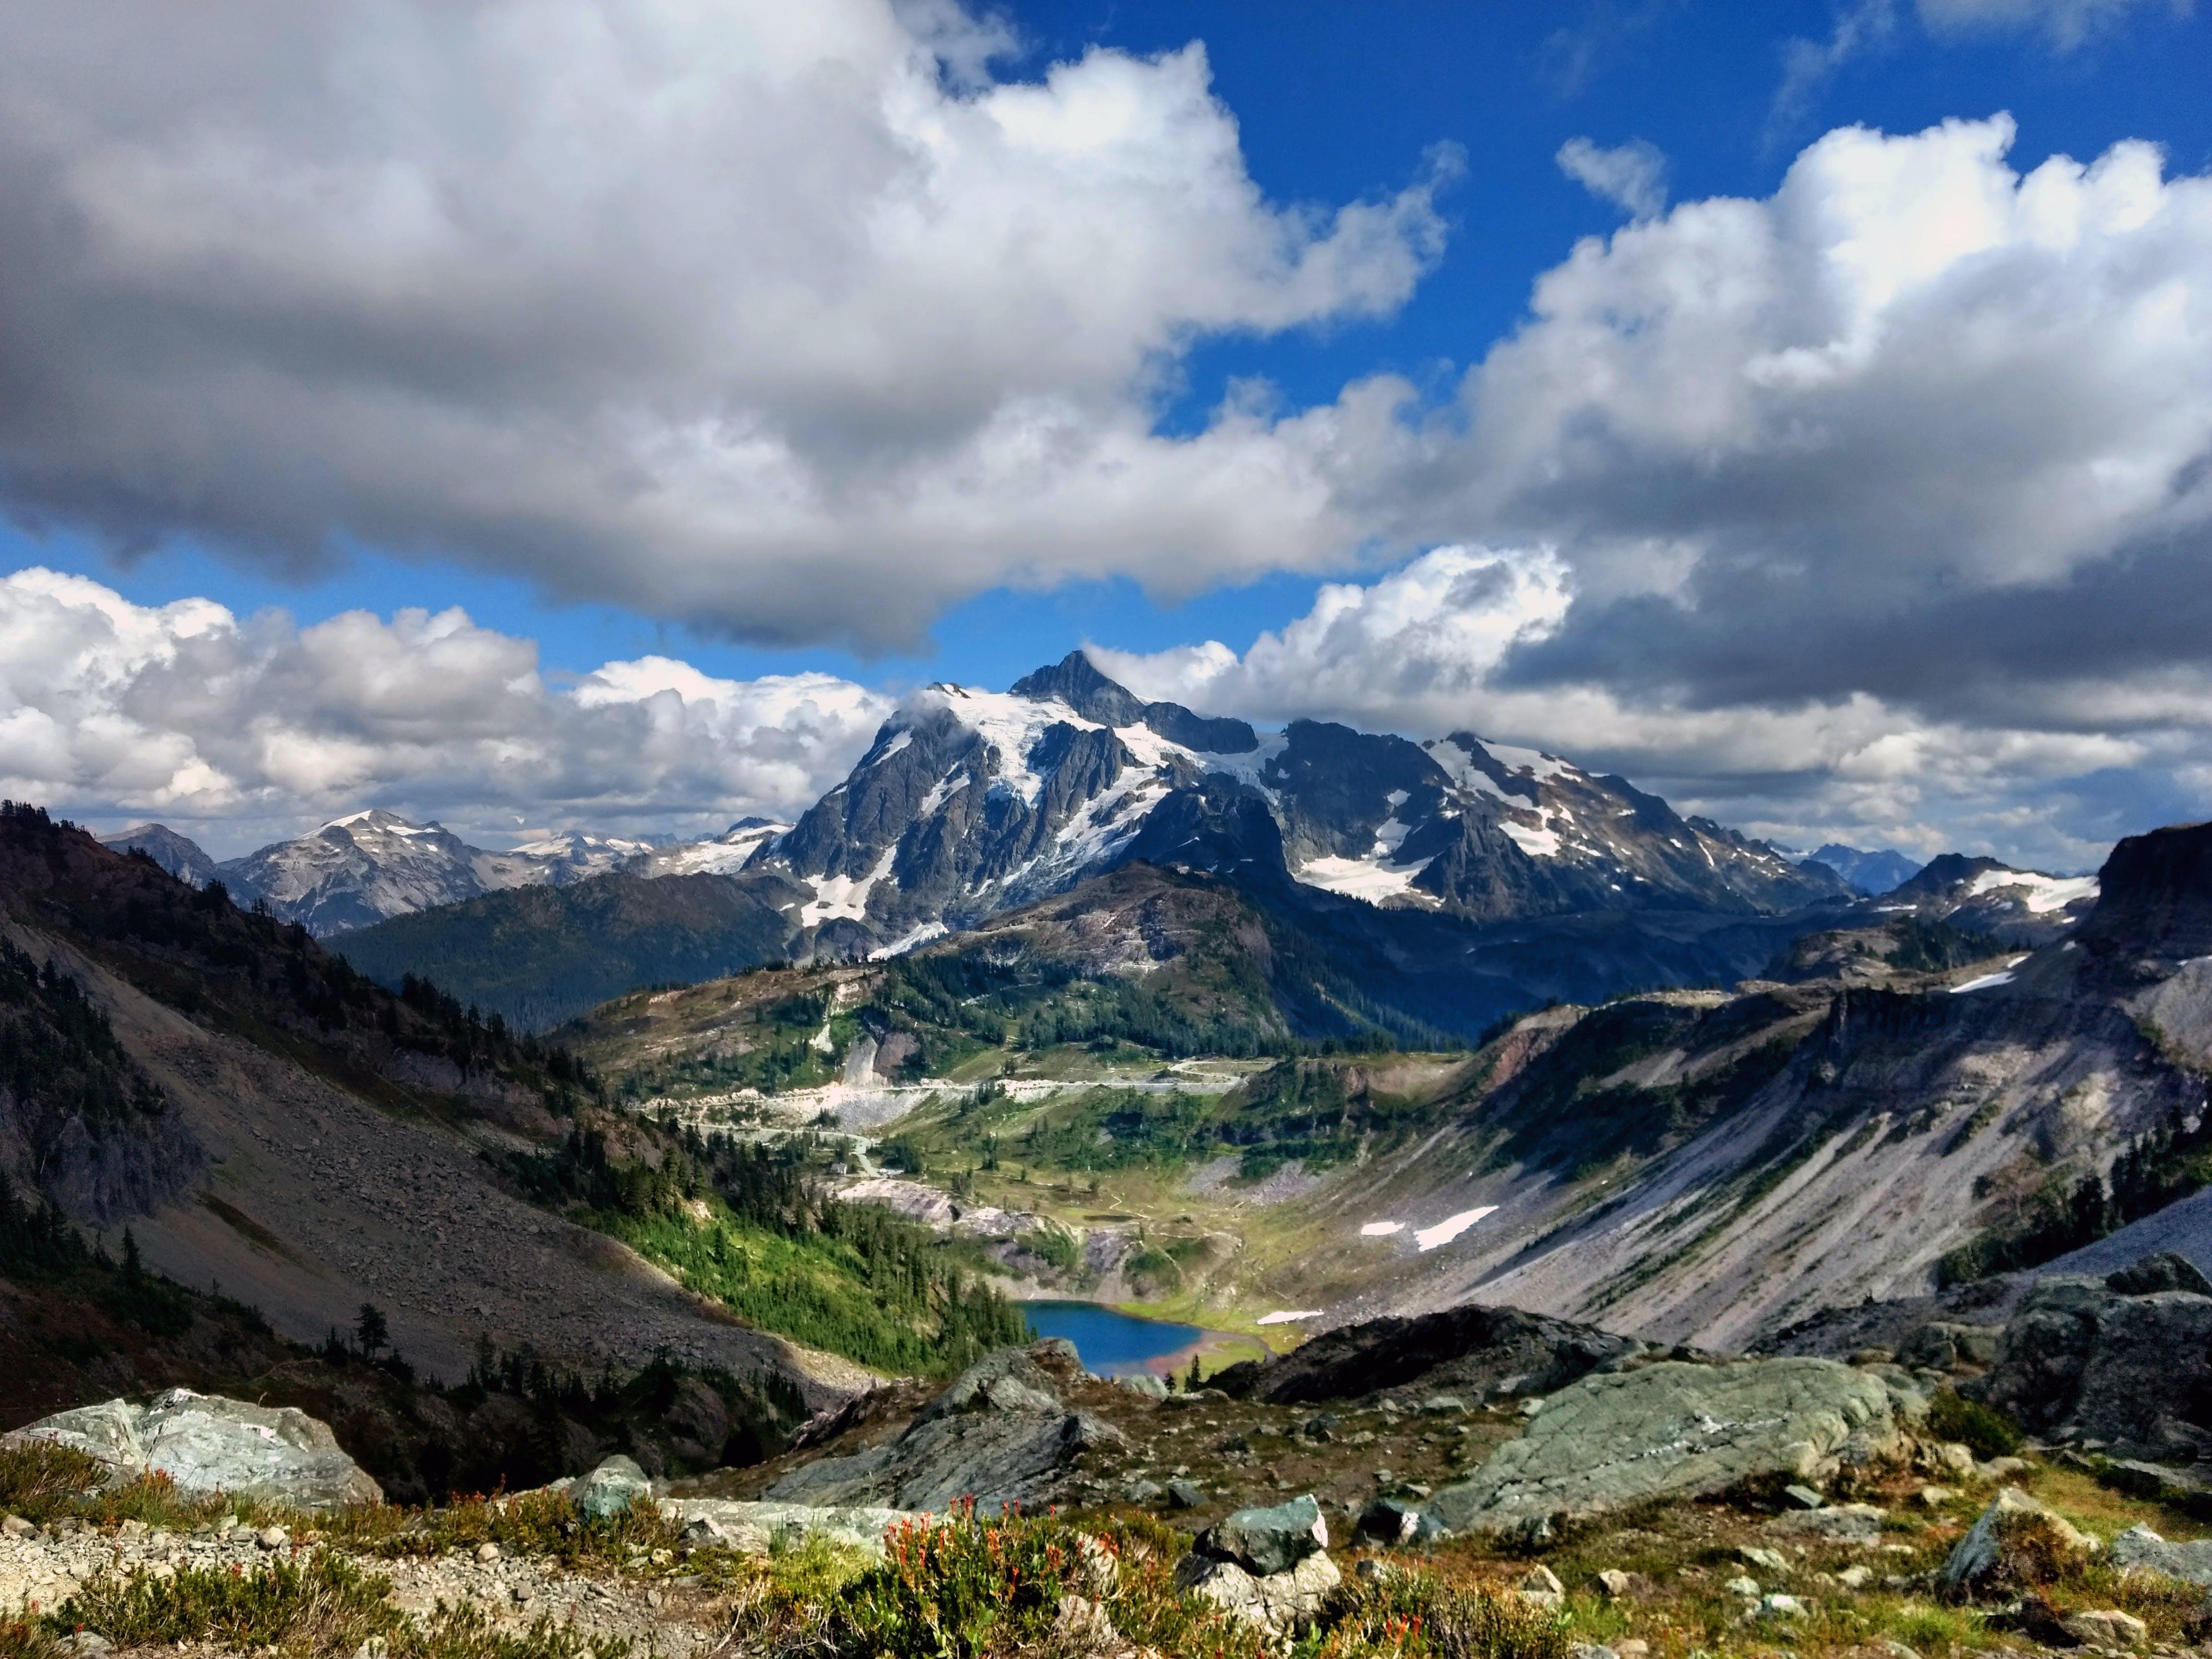 Kostenloses Stock Foto zu 4k wallpaper, alpin, berge, bewölkt